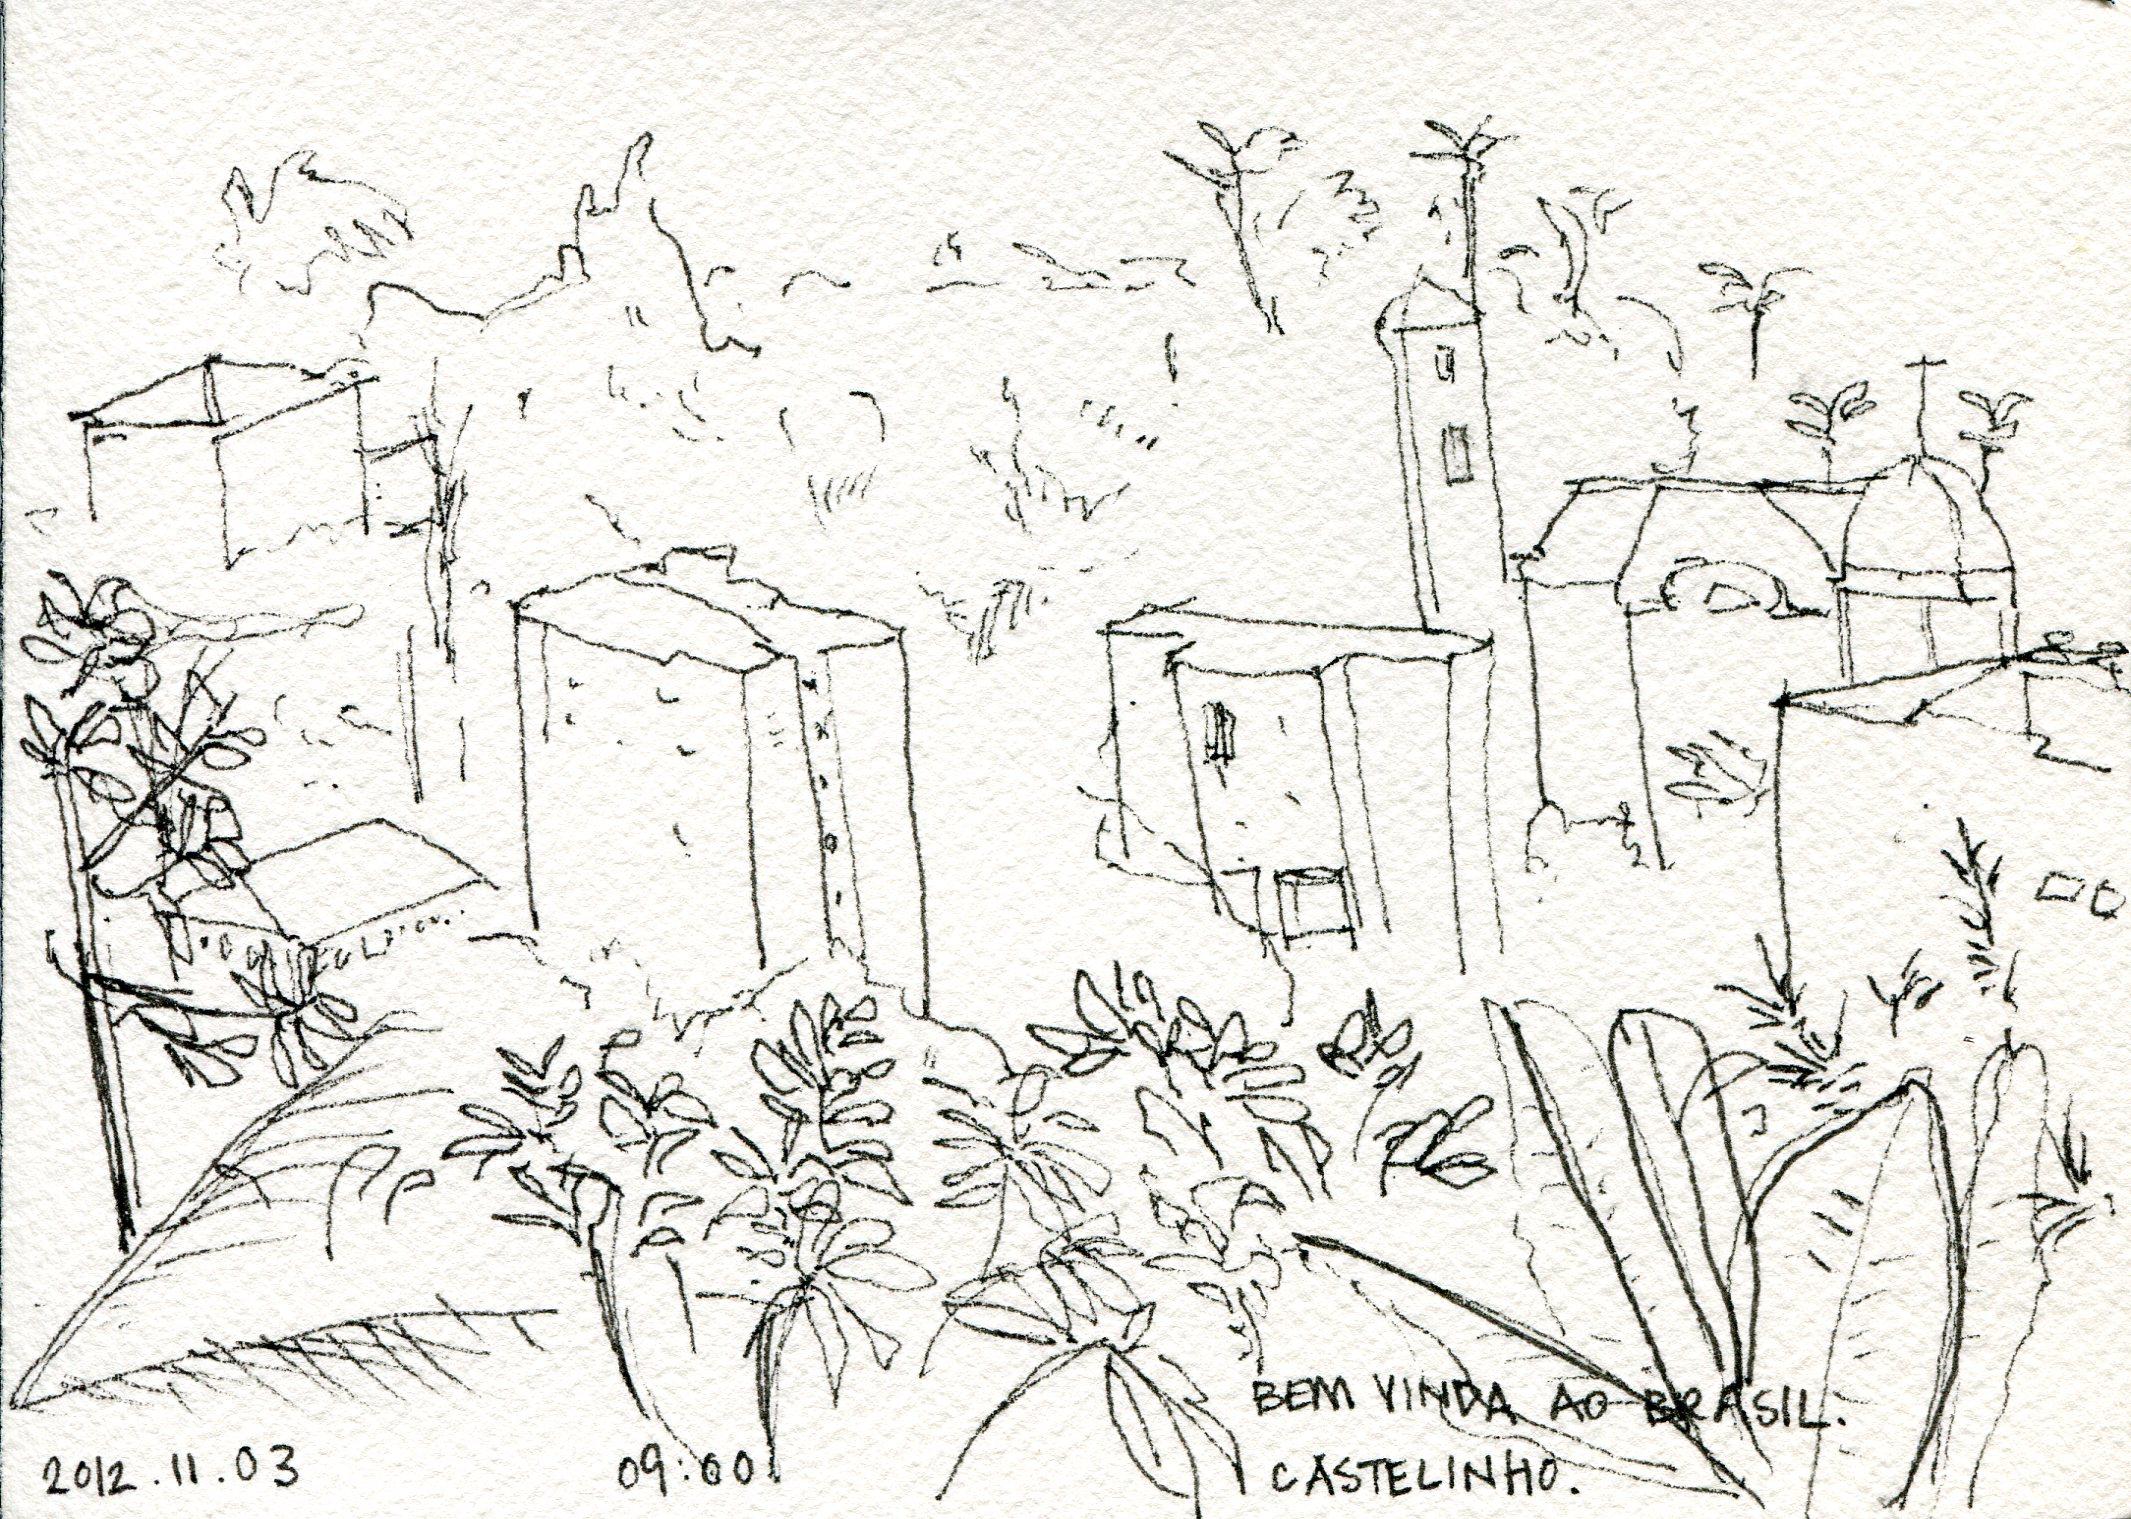 2012-11-18 drawing003.jpg